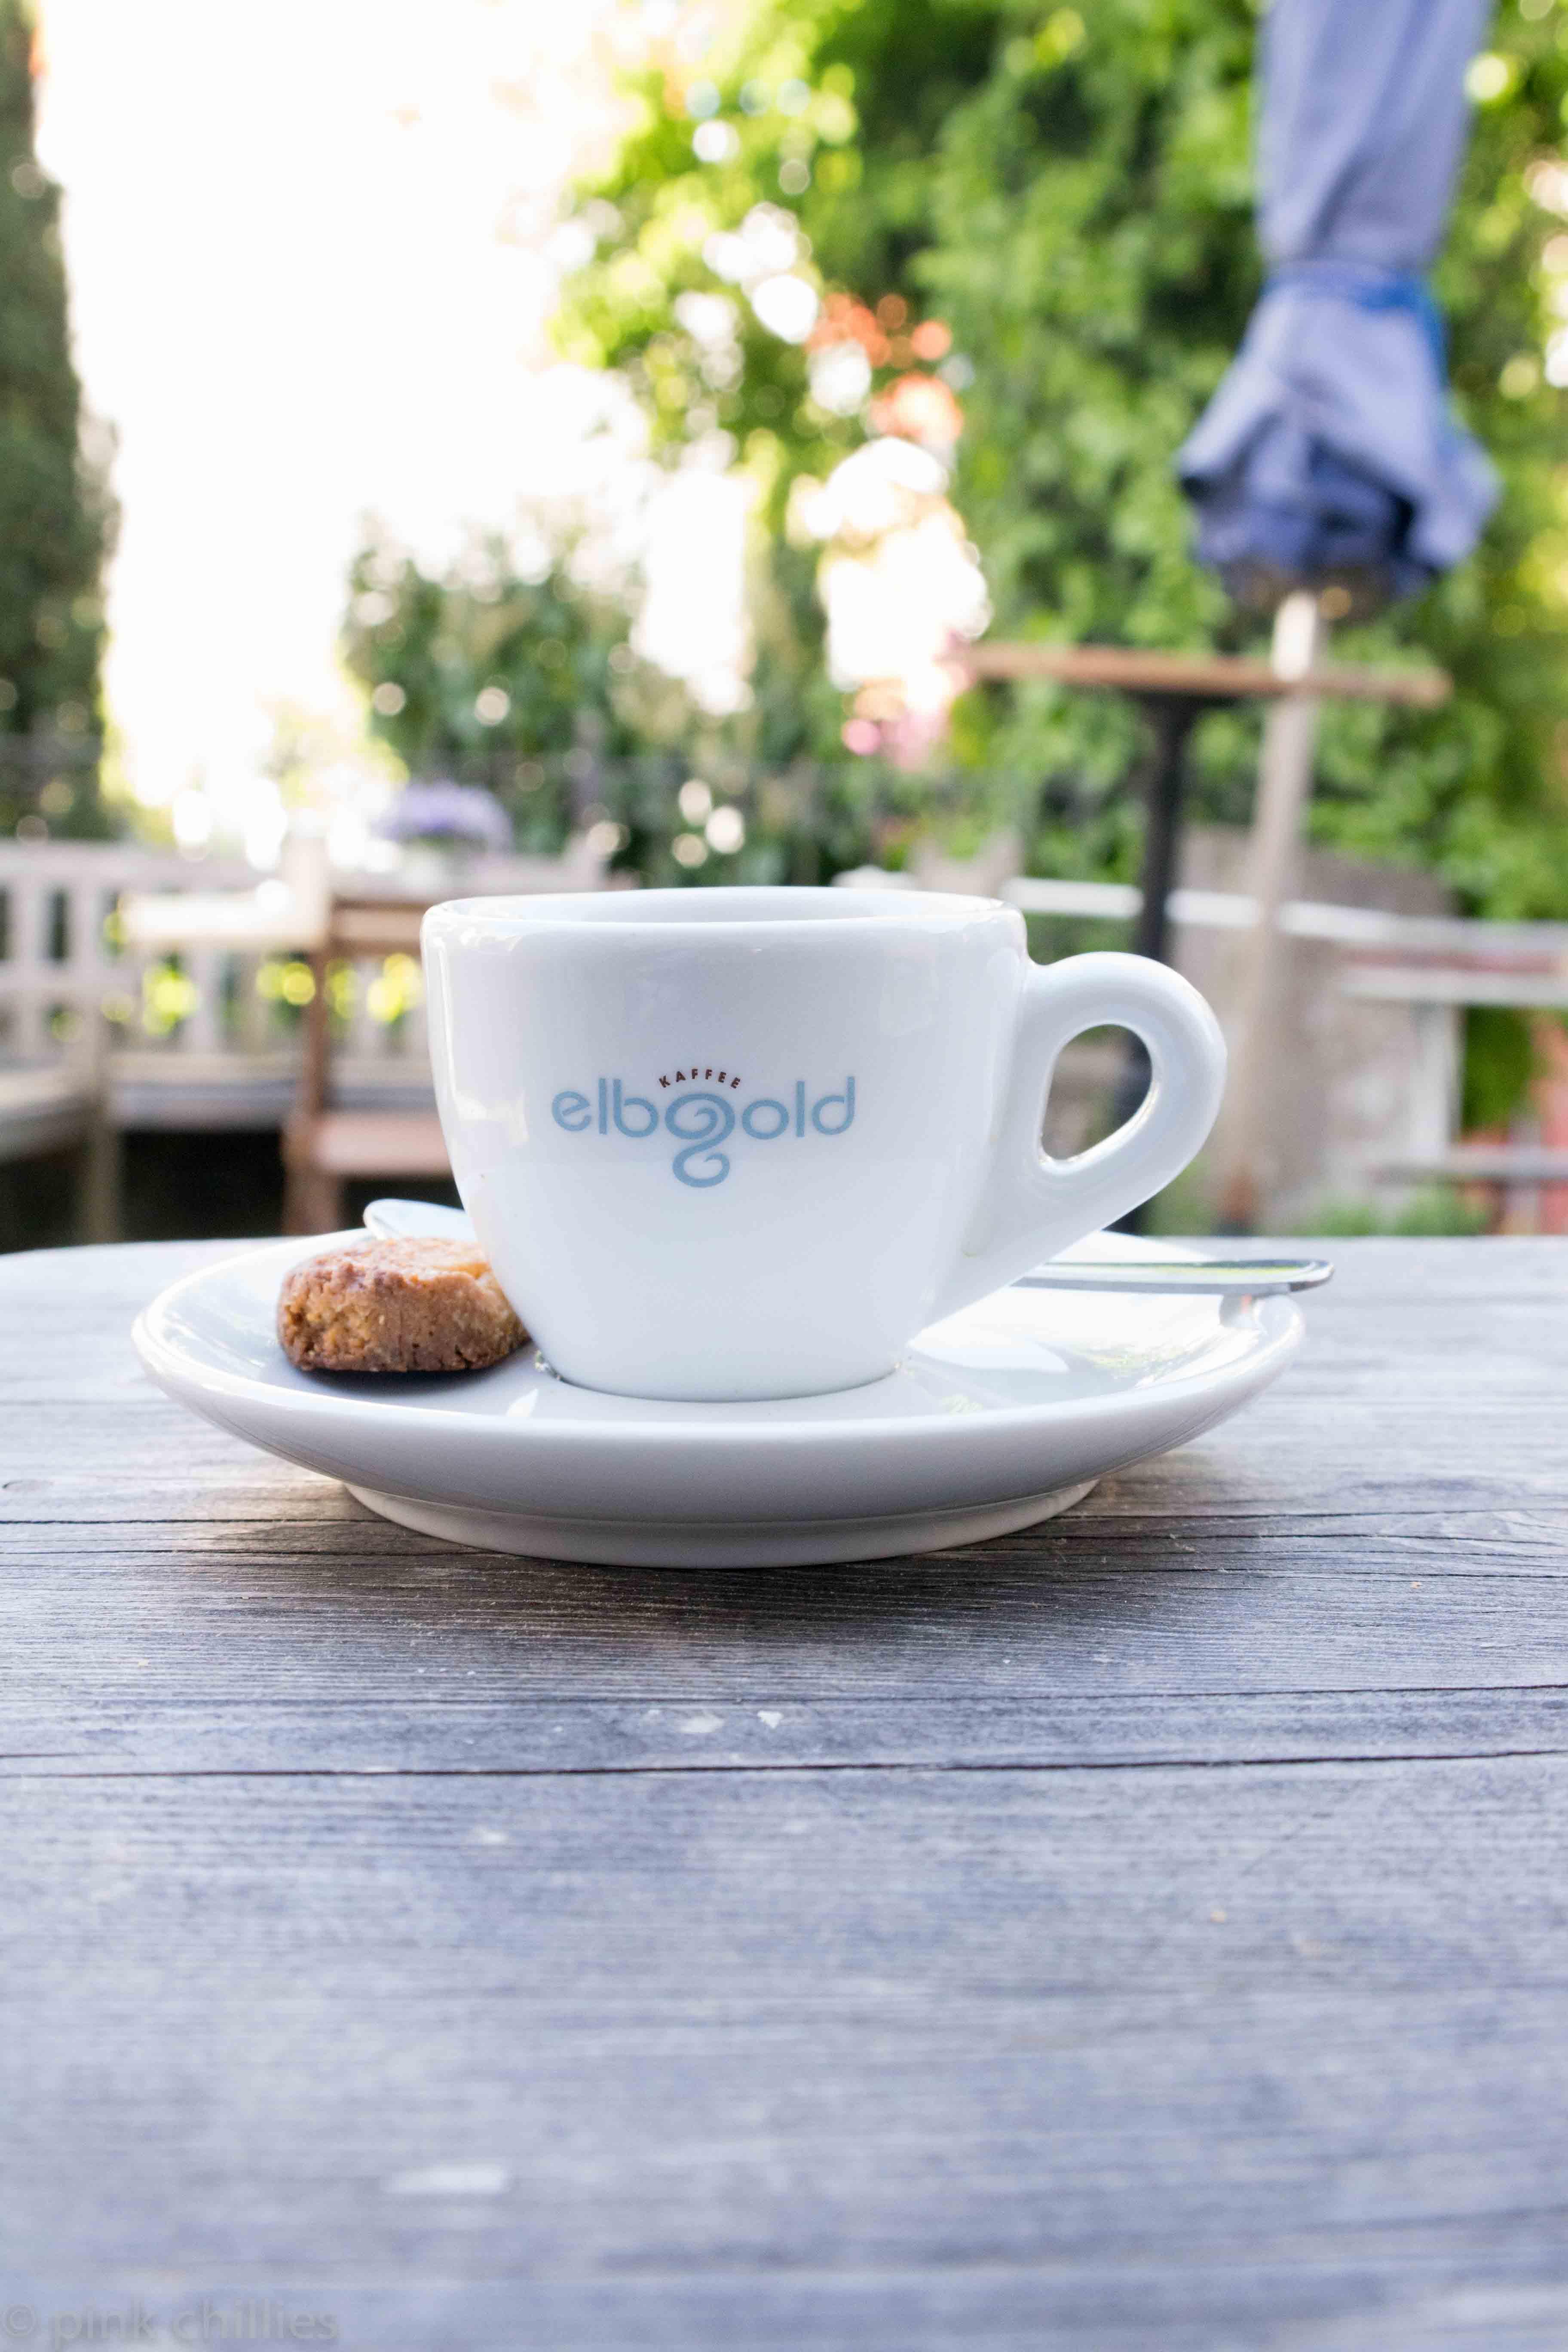 Kaffee Elbgold